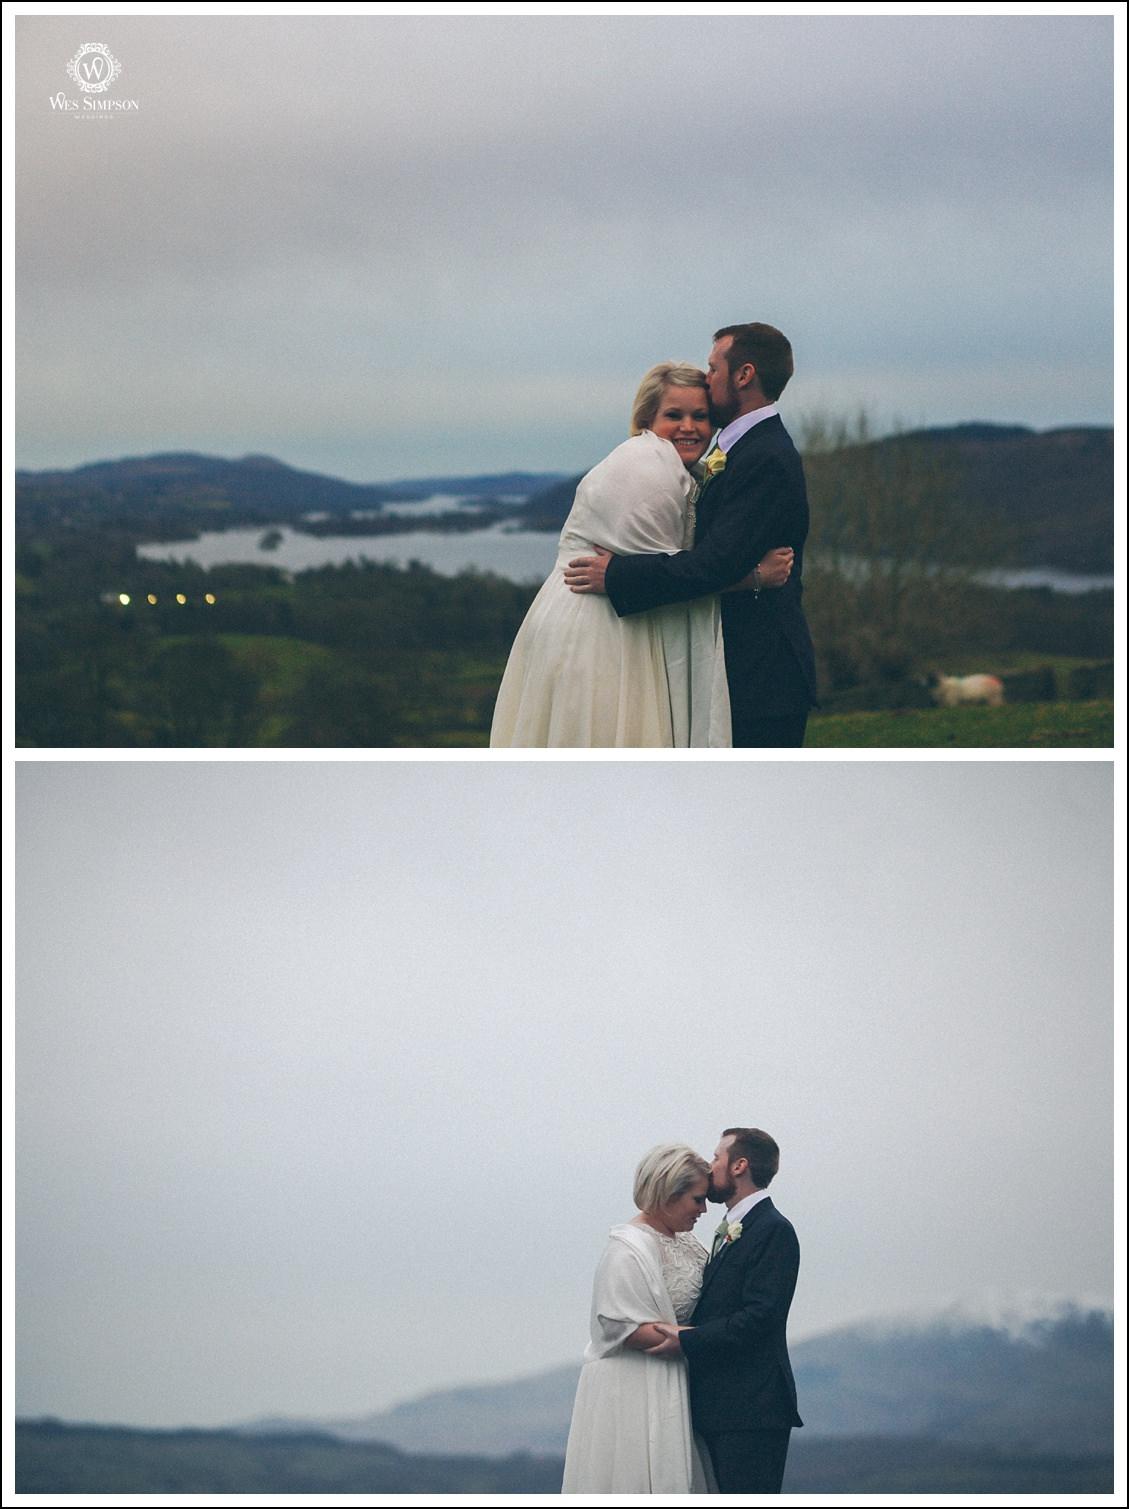 Broadoaks wedding venue, Lake District wedding photographer, Windermere, Wes Simpson photography_0074